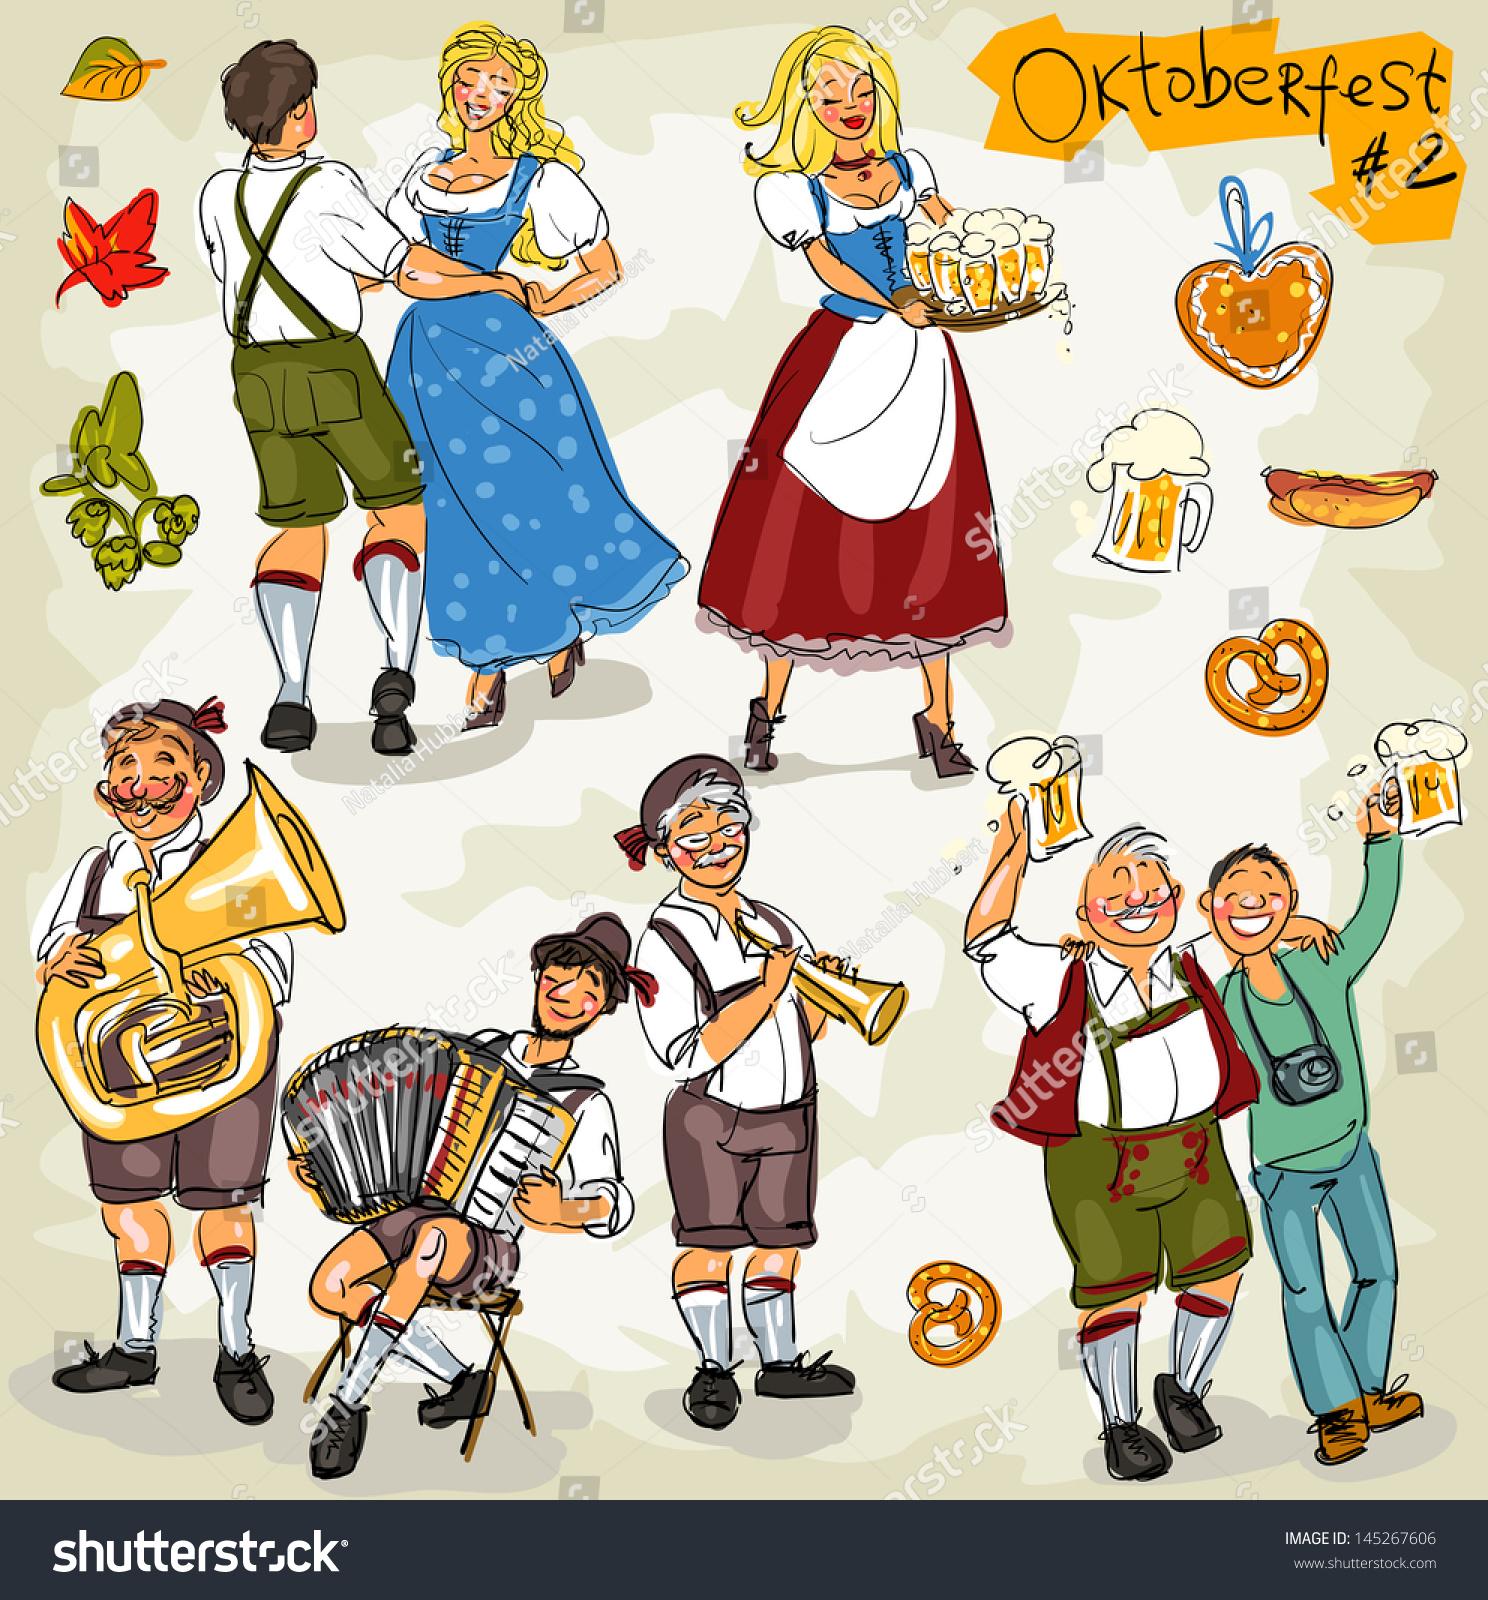 Oktoberfest Hand Drawn Clip Art Collection Stock Vector 145267606 ...